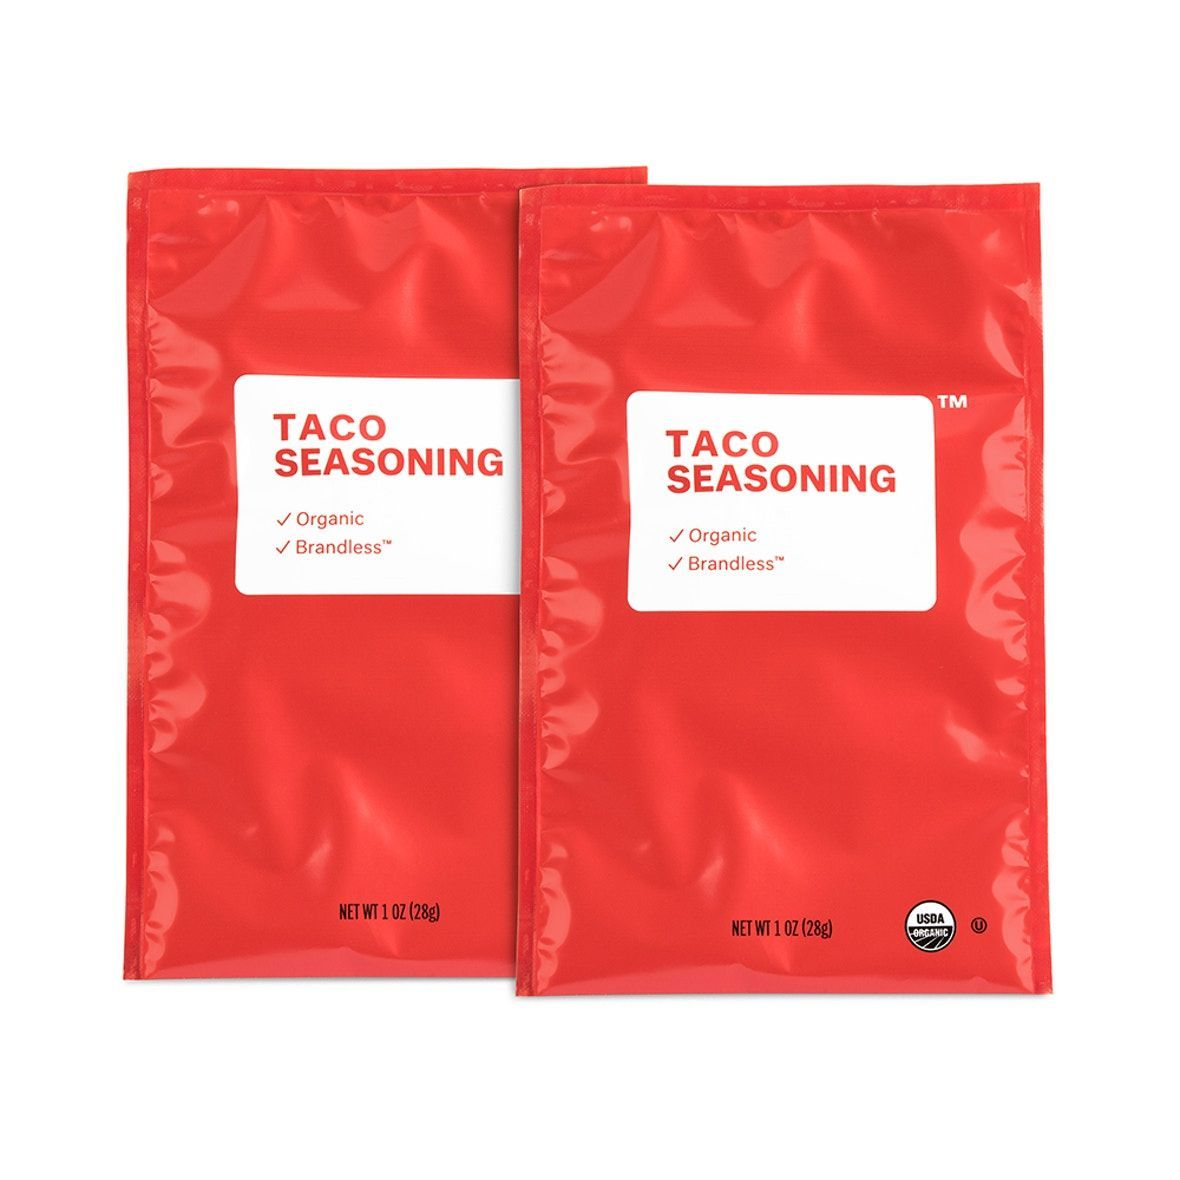 Organic Taco Seasoning Packet - 2 Pack #tacoseasoningpacket Organic Taco Seasoning Packet - 2 pk   Brandless $3 #tacoseasoningpacket